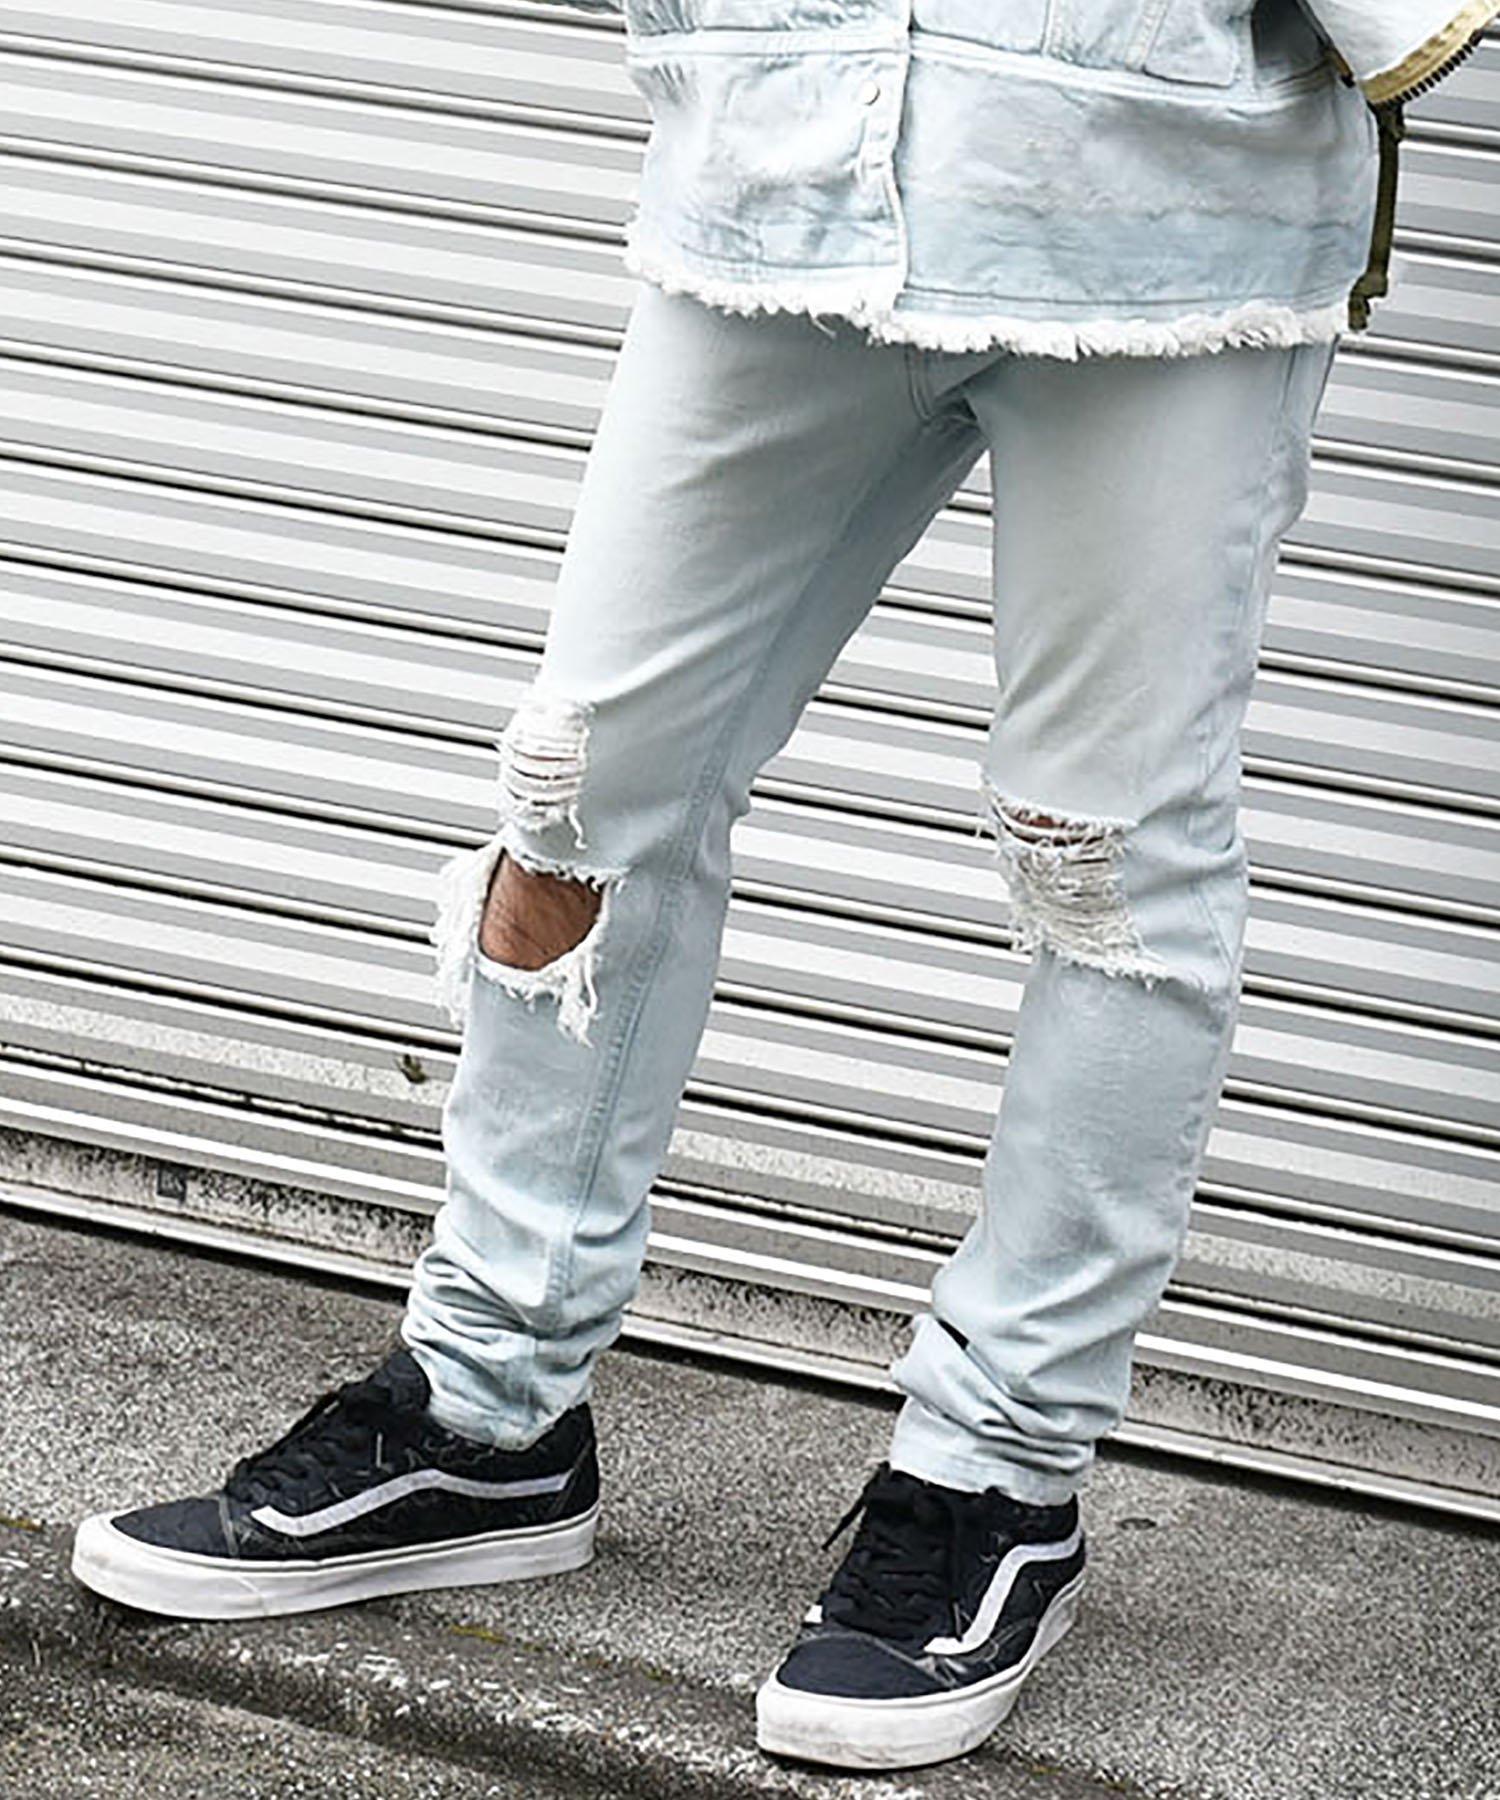 40%off! dirtytoy(ダーティートイ)Bleach Denim Pants